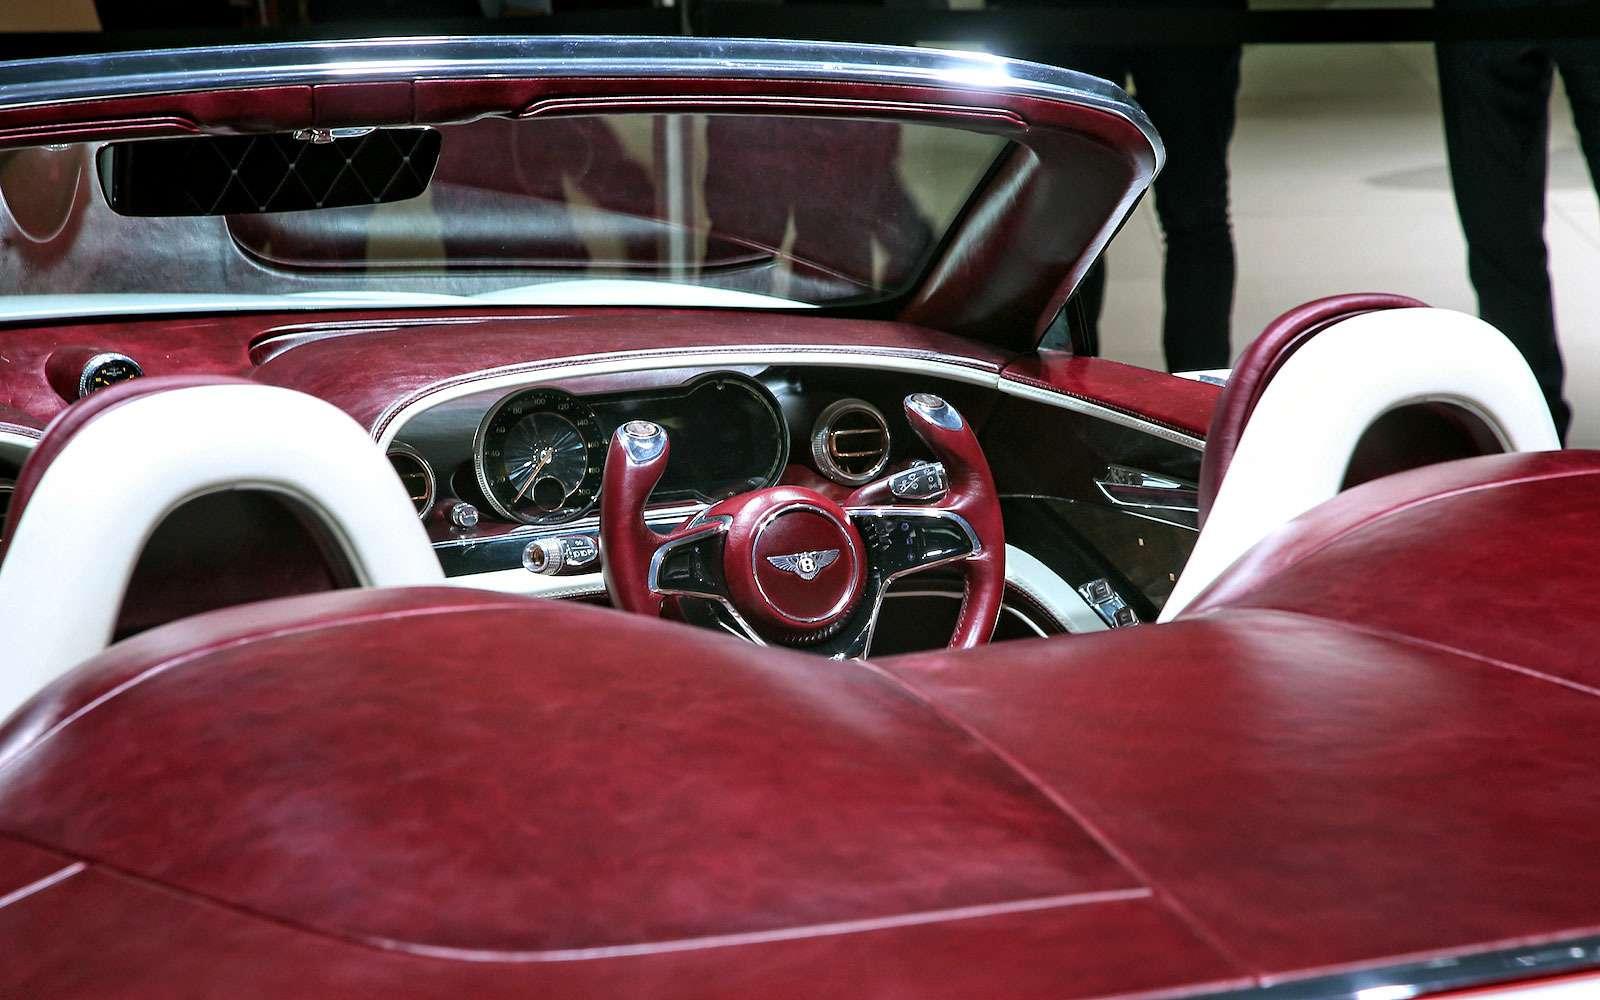 Безвредная красота: Bentley показала родстер EXP 12Speed 6e— фото 718265